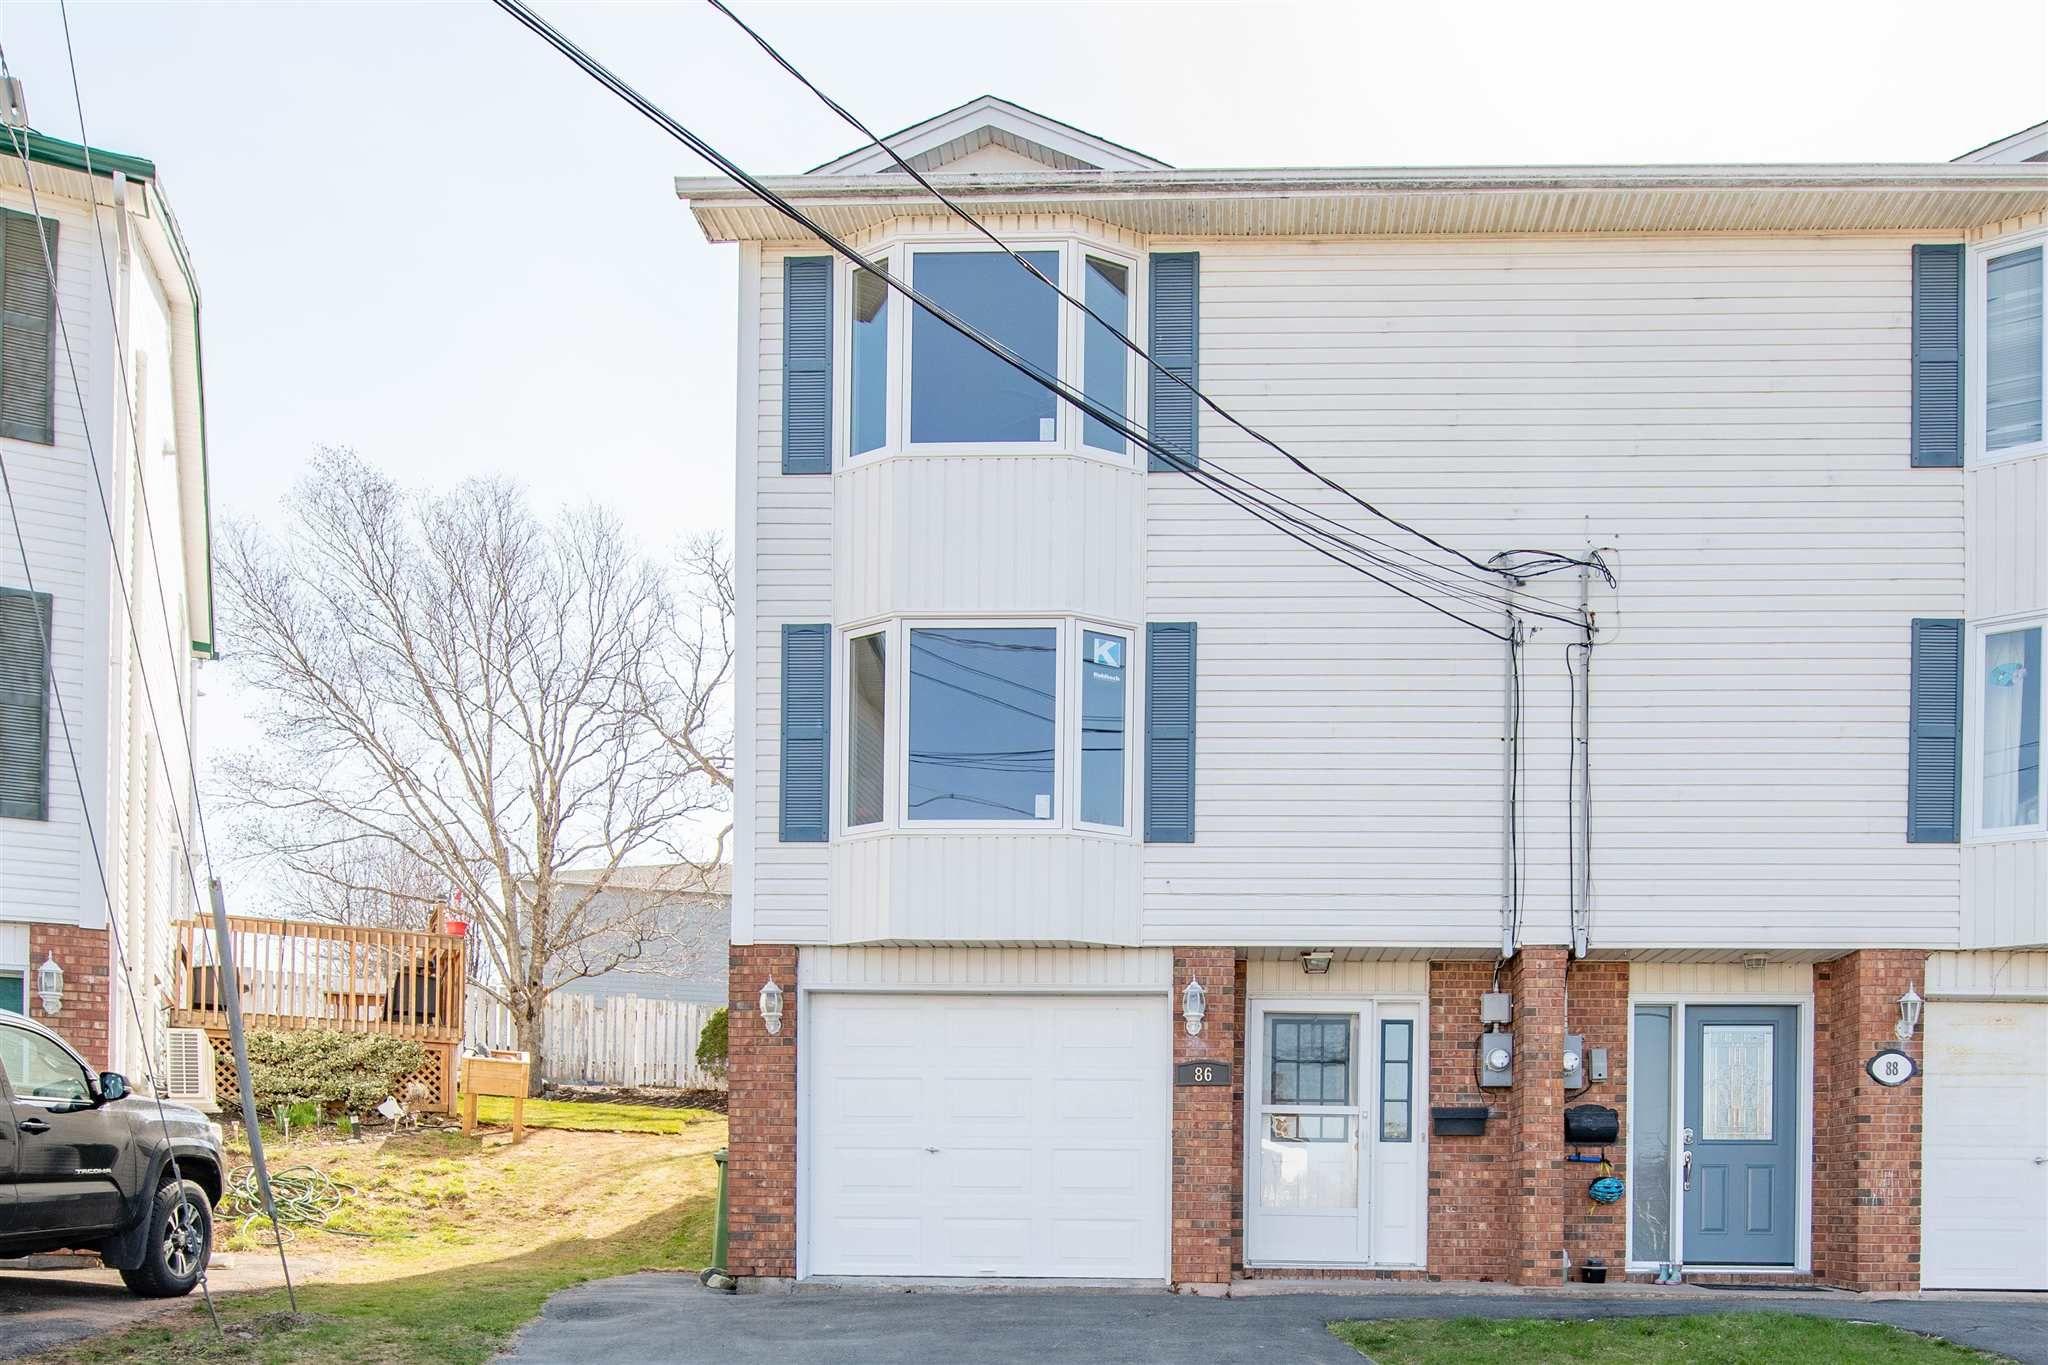 Main Photo: 86 Andover Street in Dartmouth: 14-Dartmouth Montebello, Port Wallis, Keystone Residential for sale (Halifax-Dartmouth)  : MLS®# 202110106